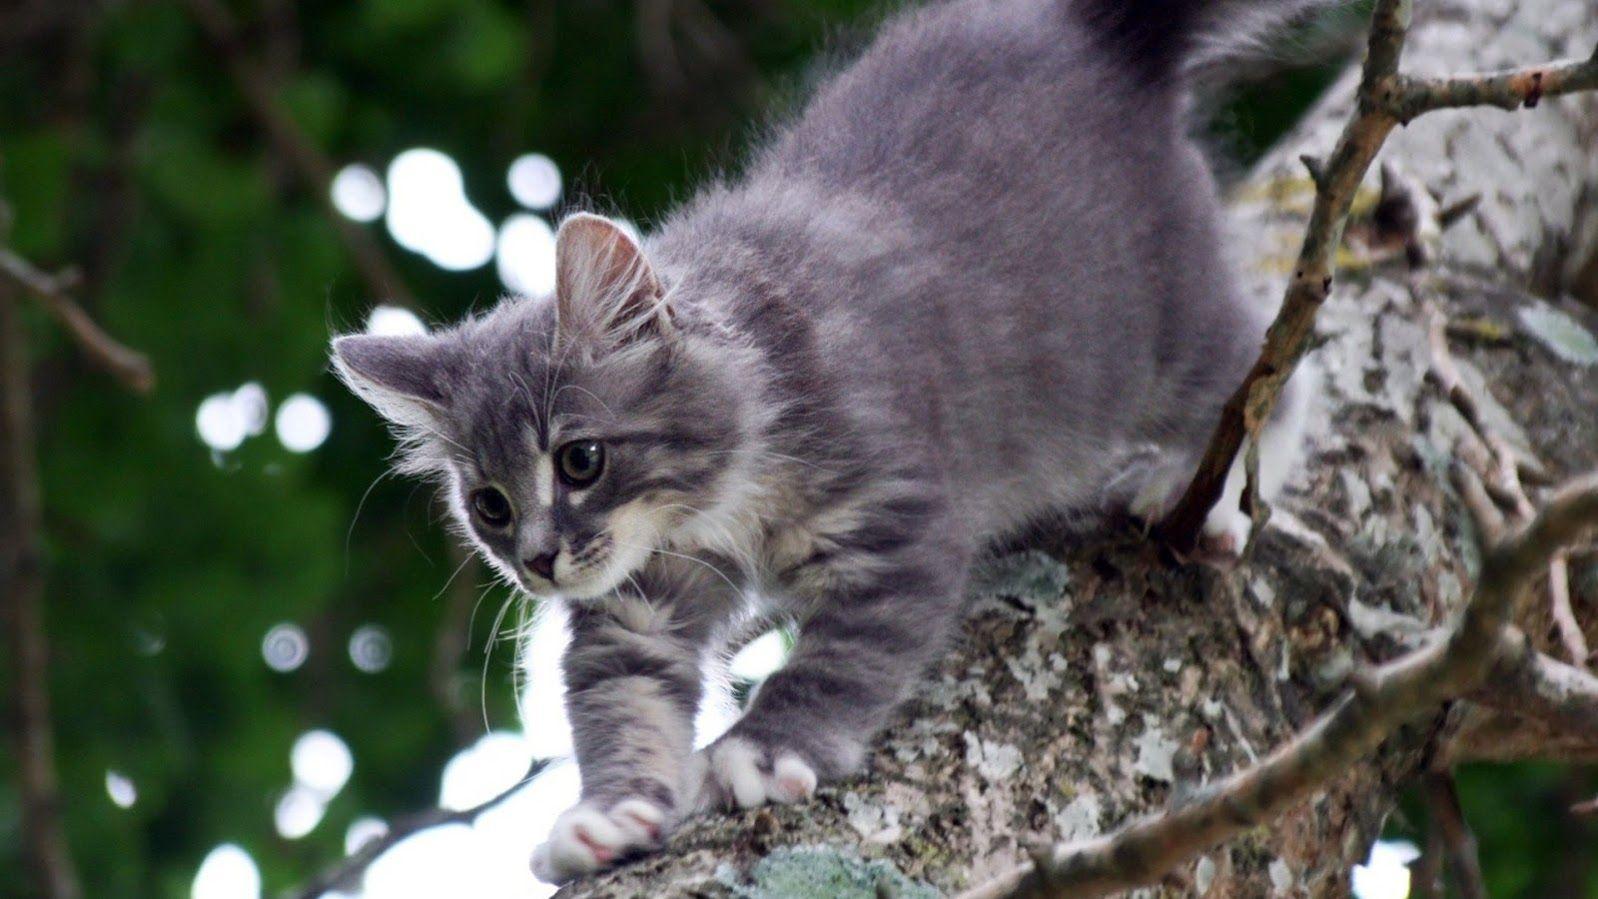 Wilde katzen, Katzenbabys, Niedliche tierbabys